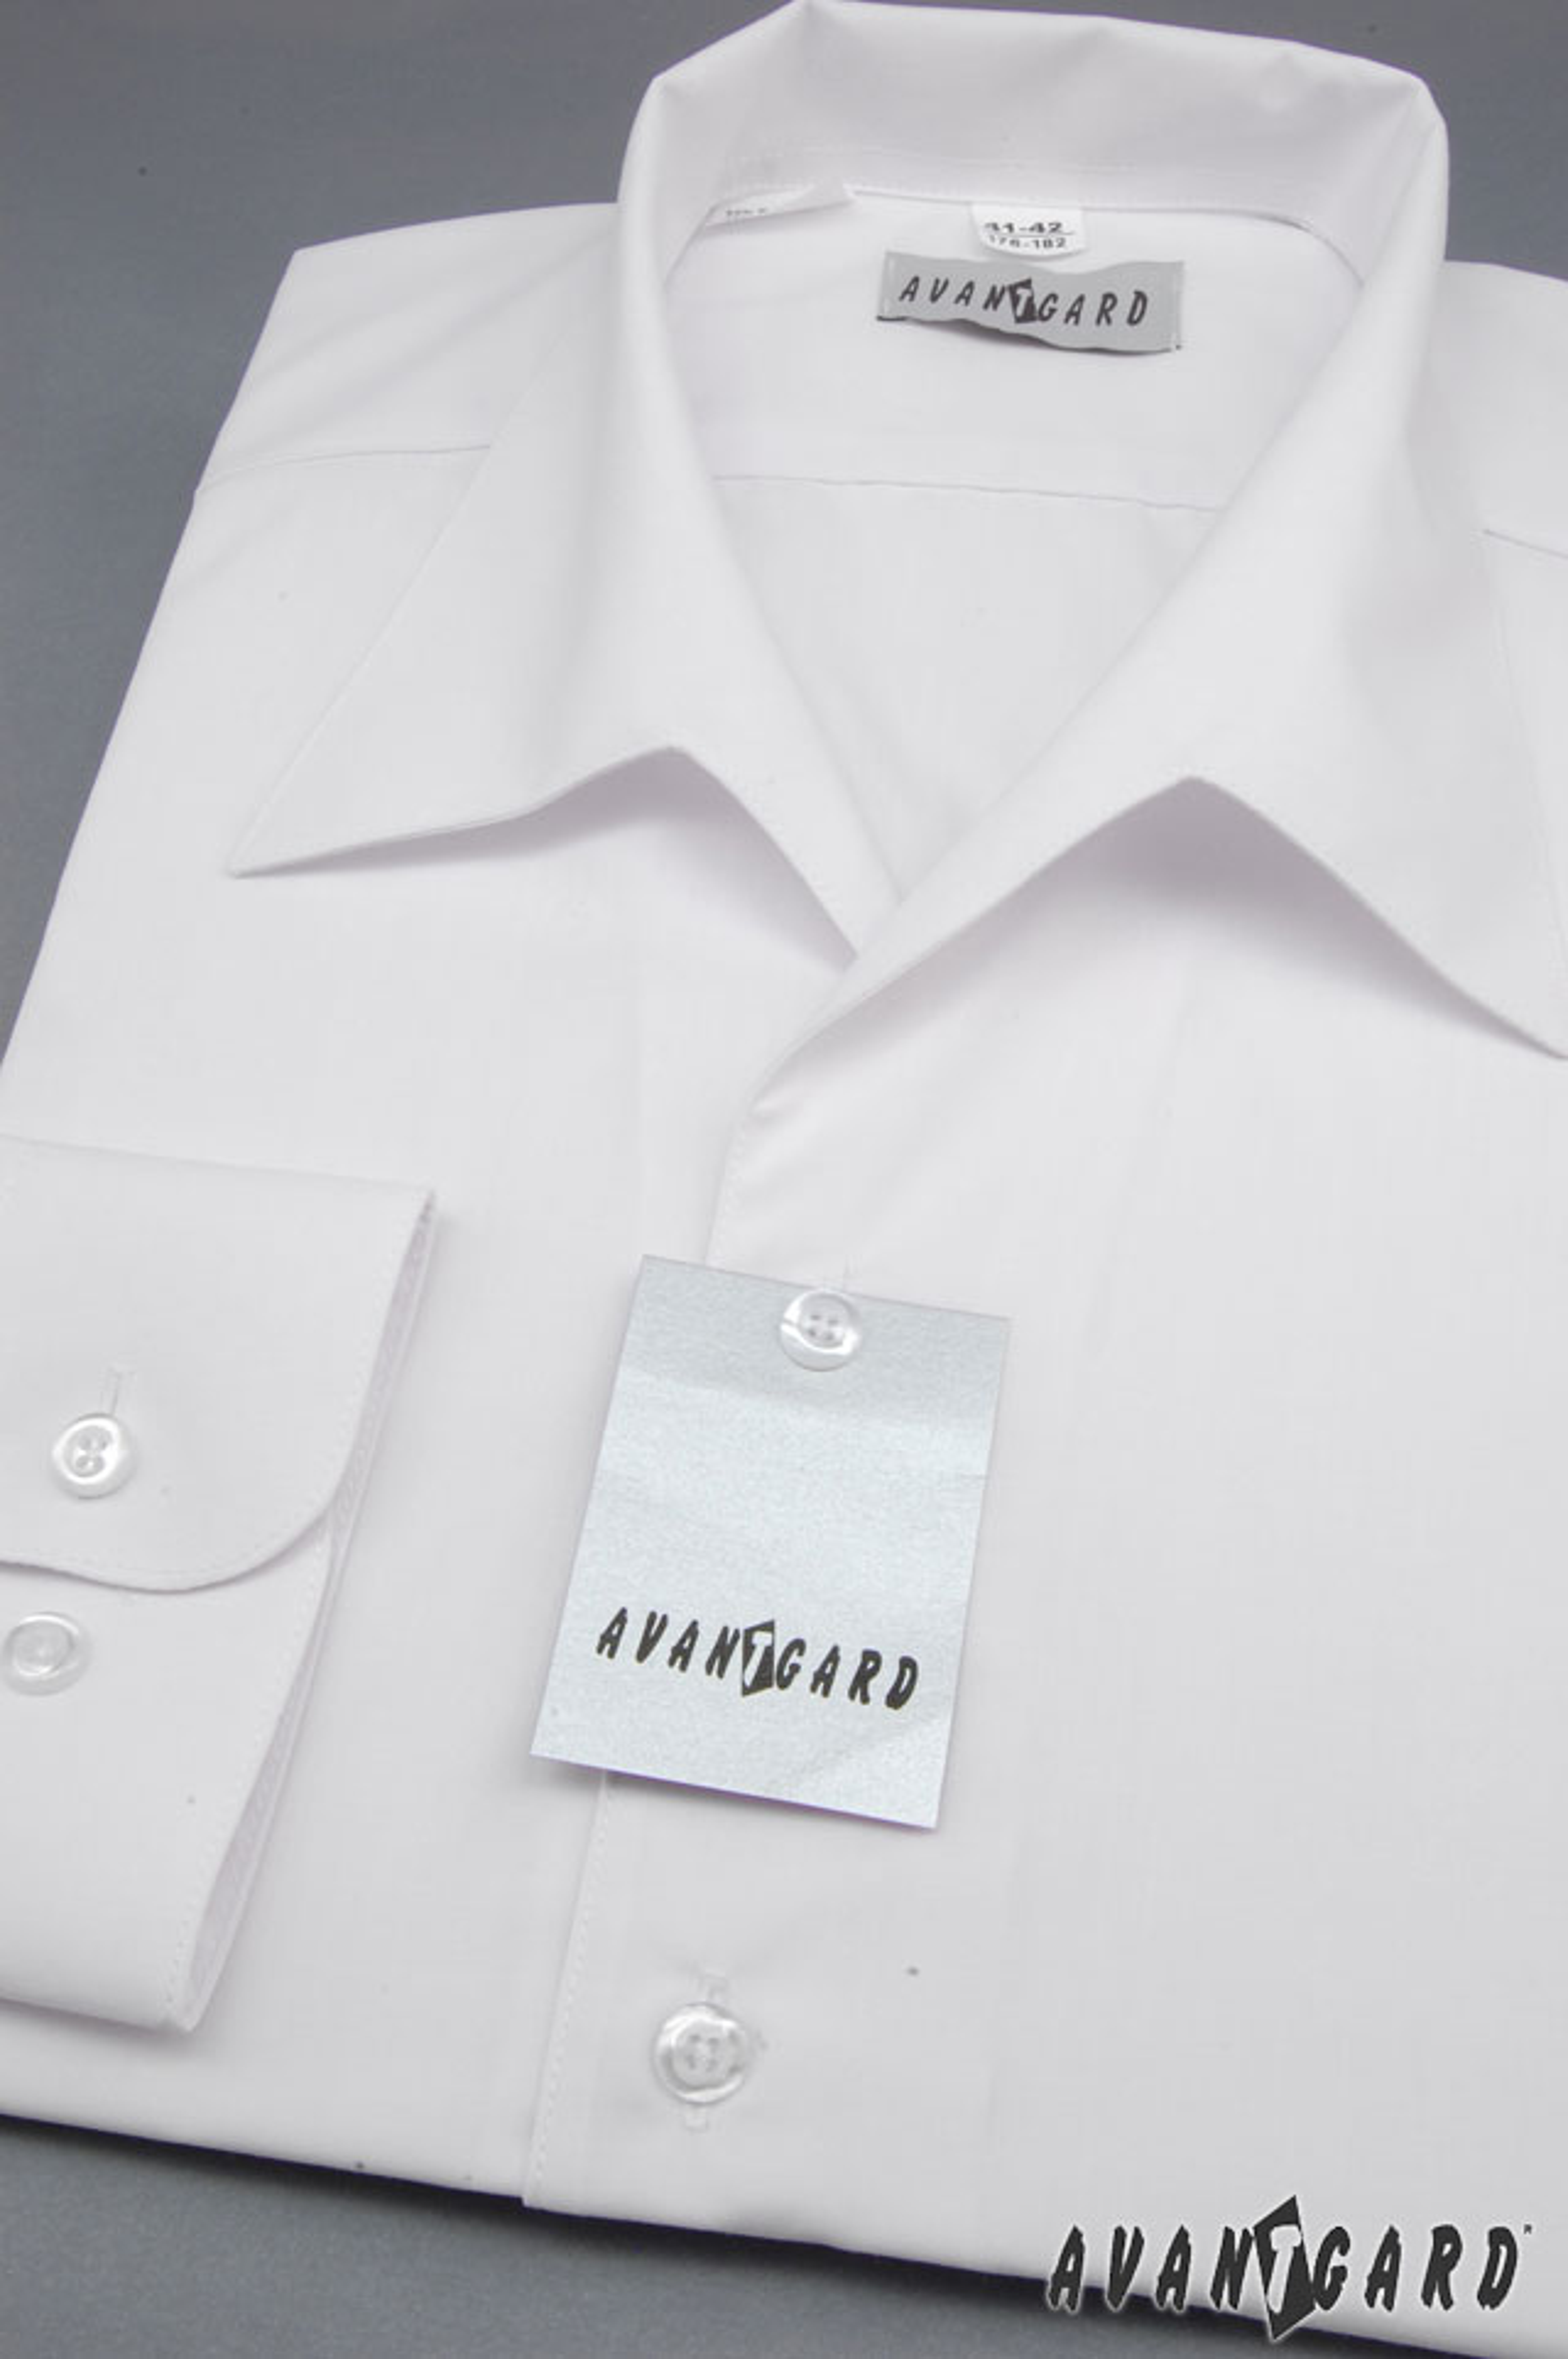 Avantgard pánská košile rozhalenka dlouhý rukáv 457-1 barva bílá efd4c7da6f